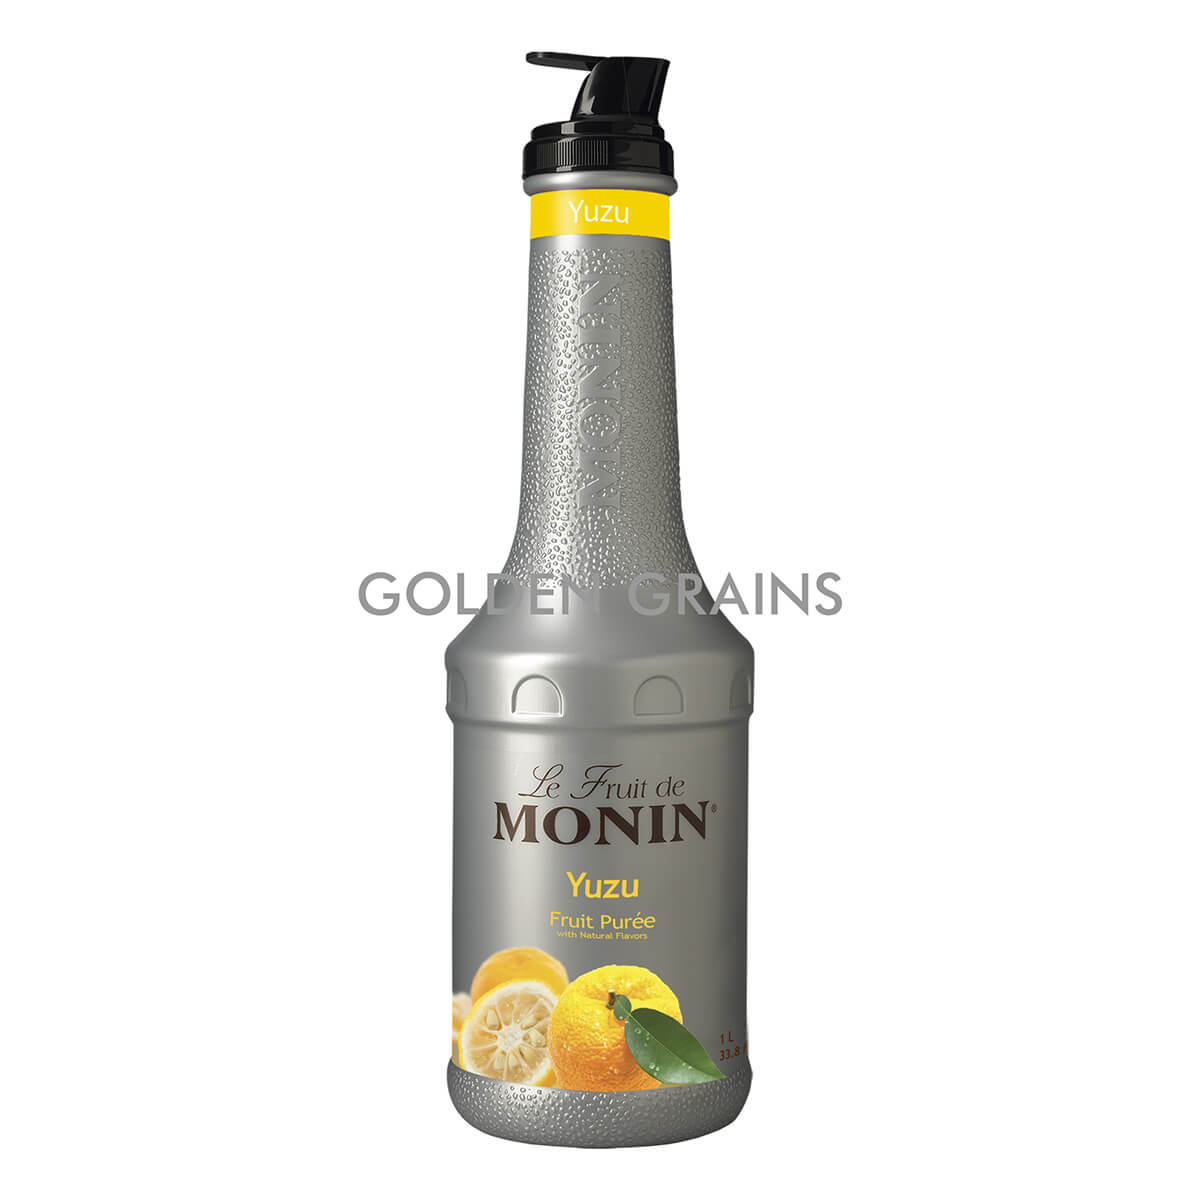 Golden Grains Monin - Yuzu Puree 1LTR - Front.jpg